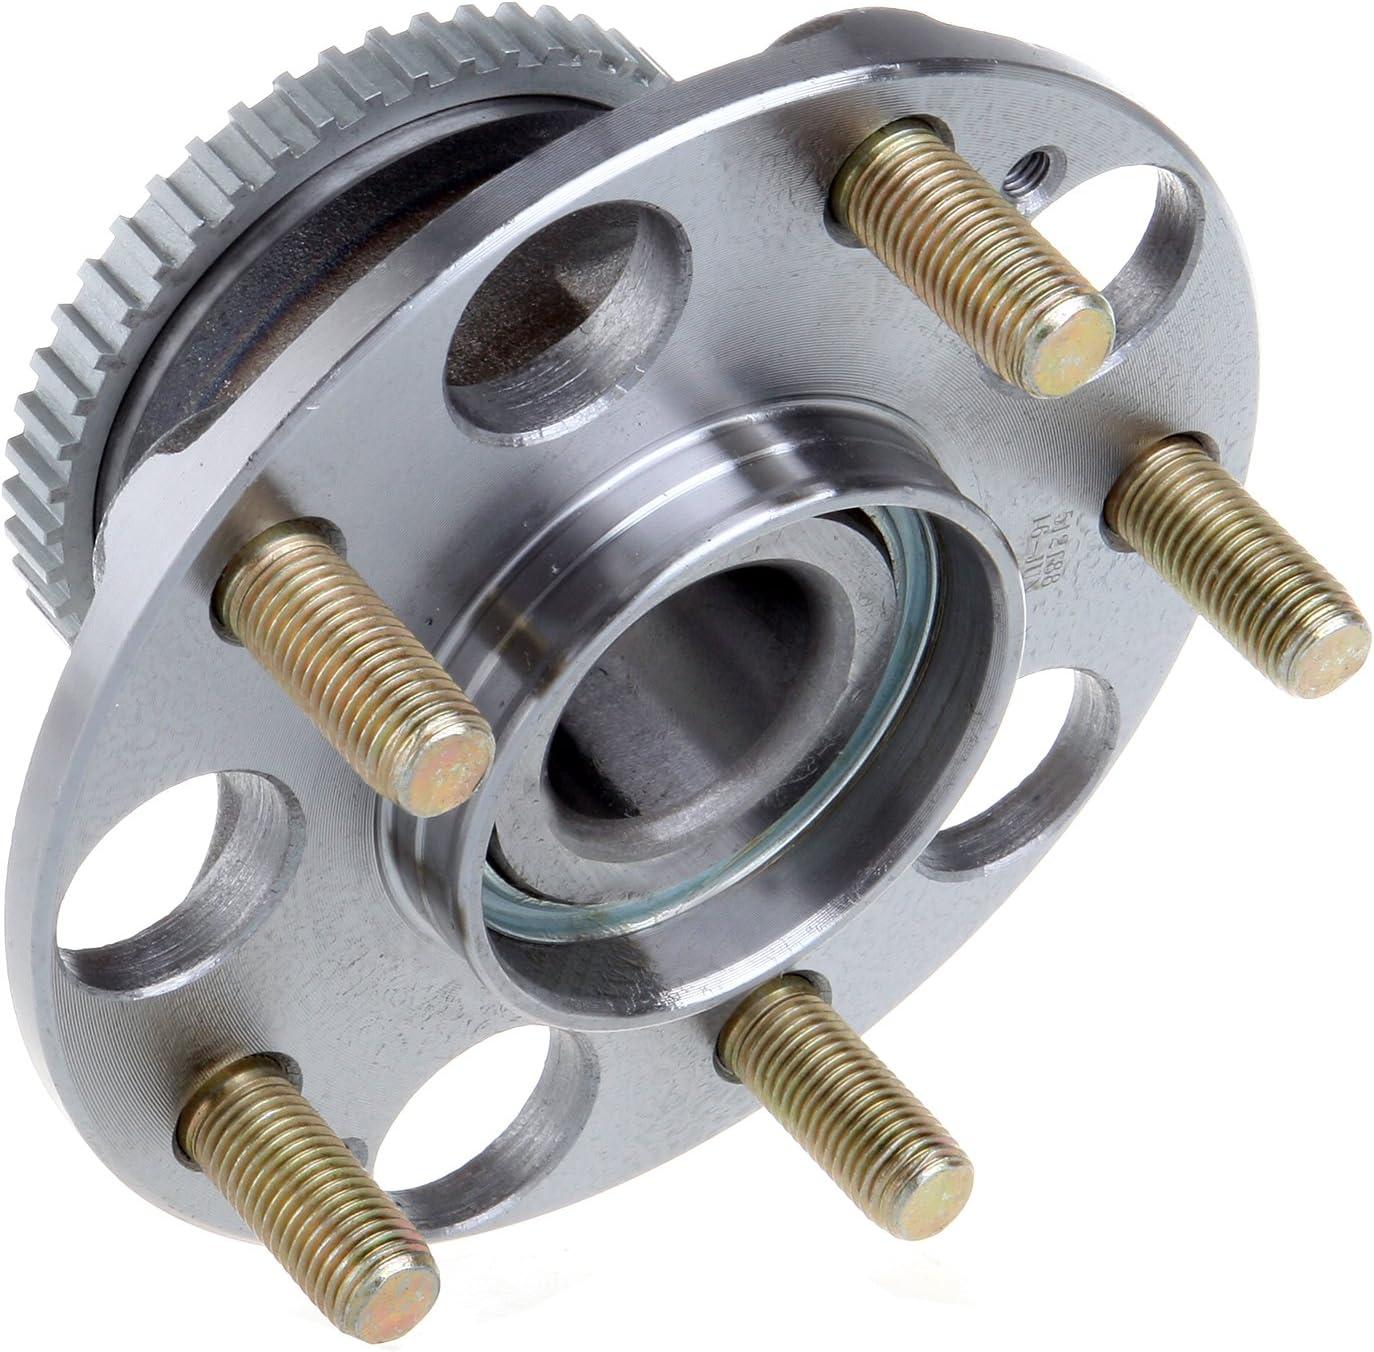 ROADFAR Wheel Bearing /& Hub Assemblies fit for 2004-2008 Acura TL 2003-2007 Honda Accord Rear Wheel Hub and Bearing Assembly 512188